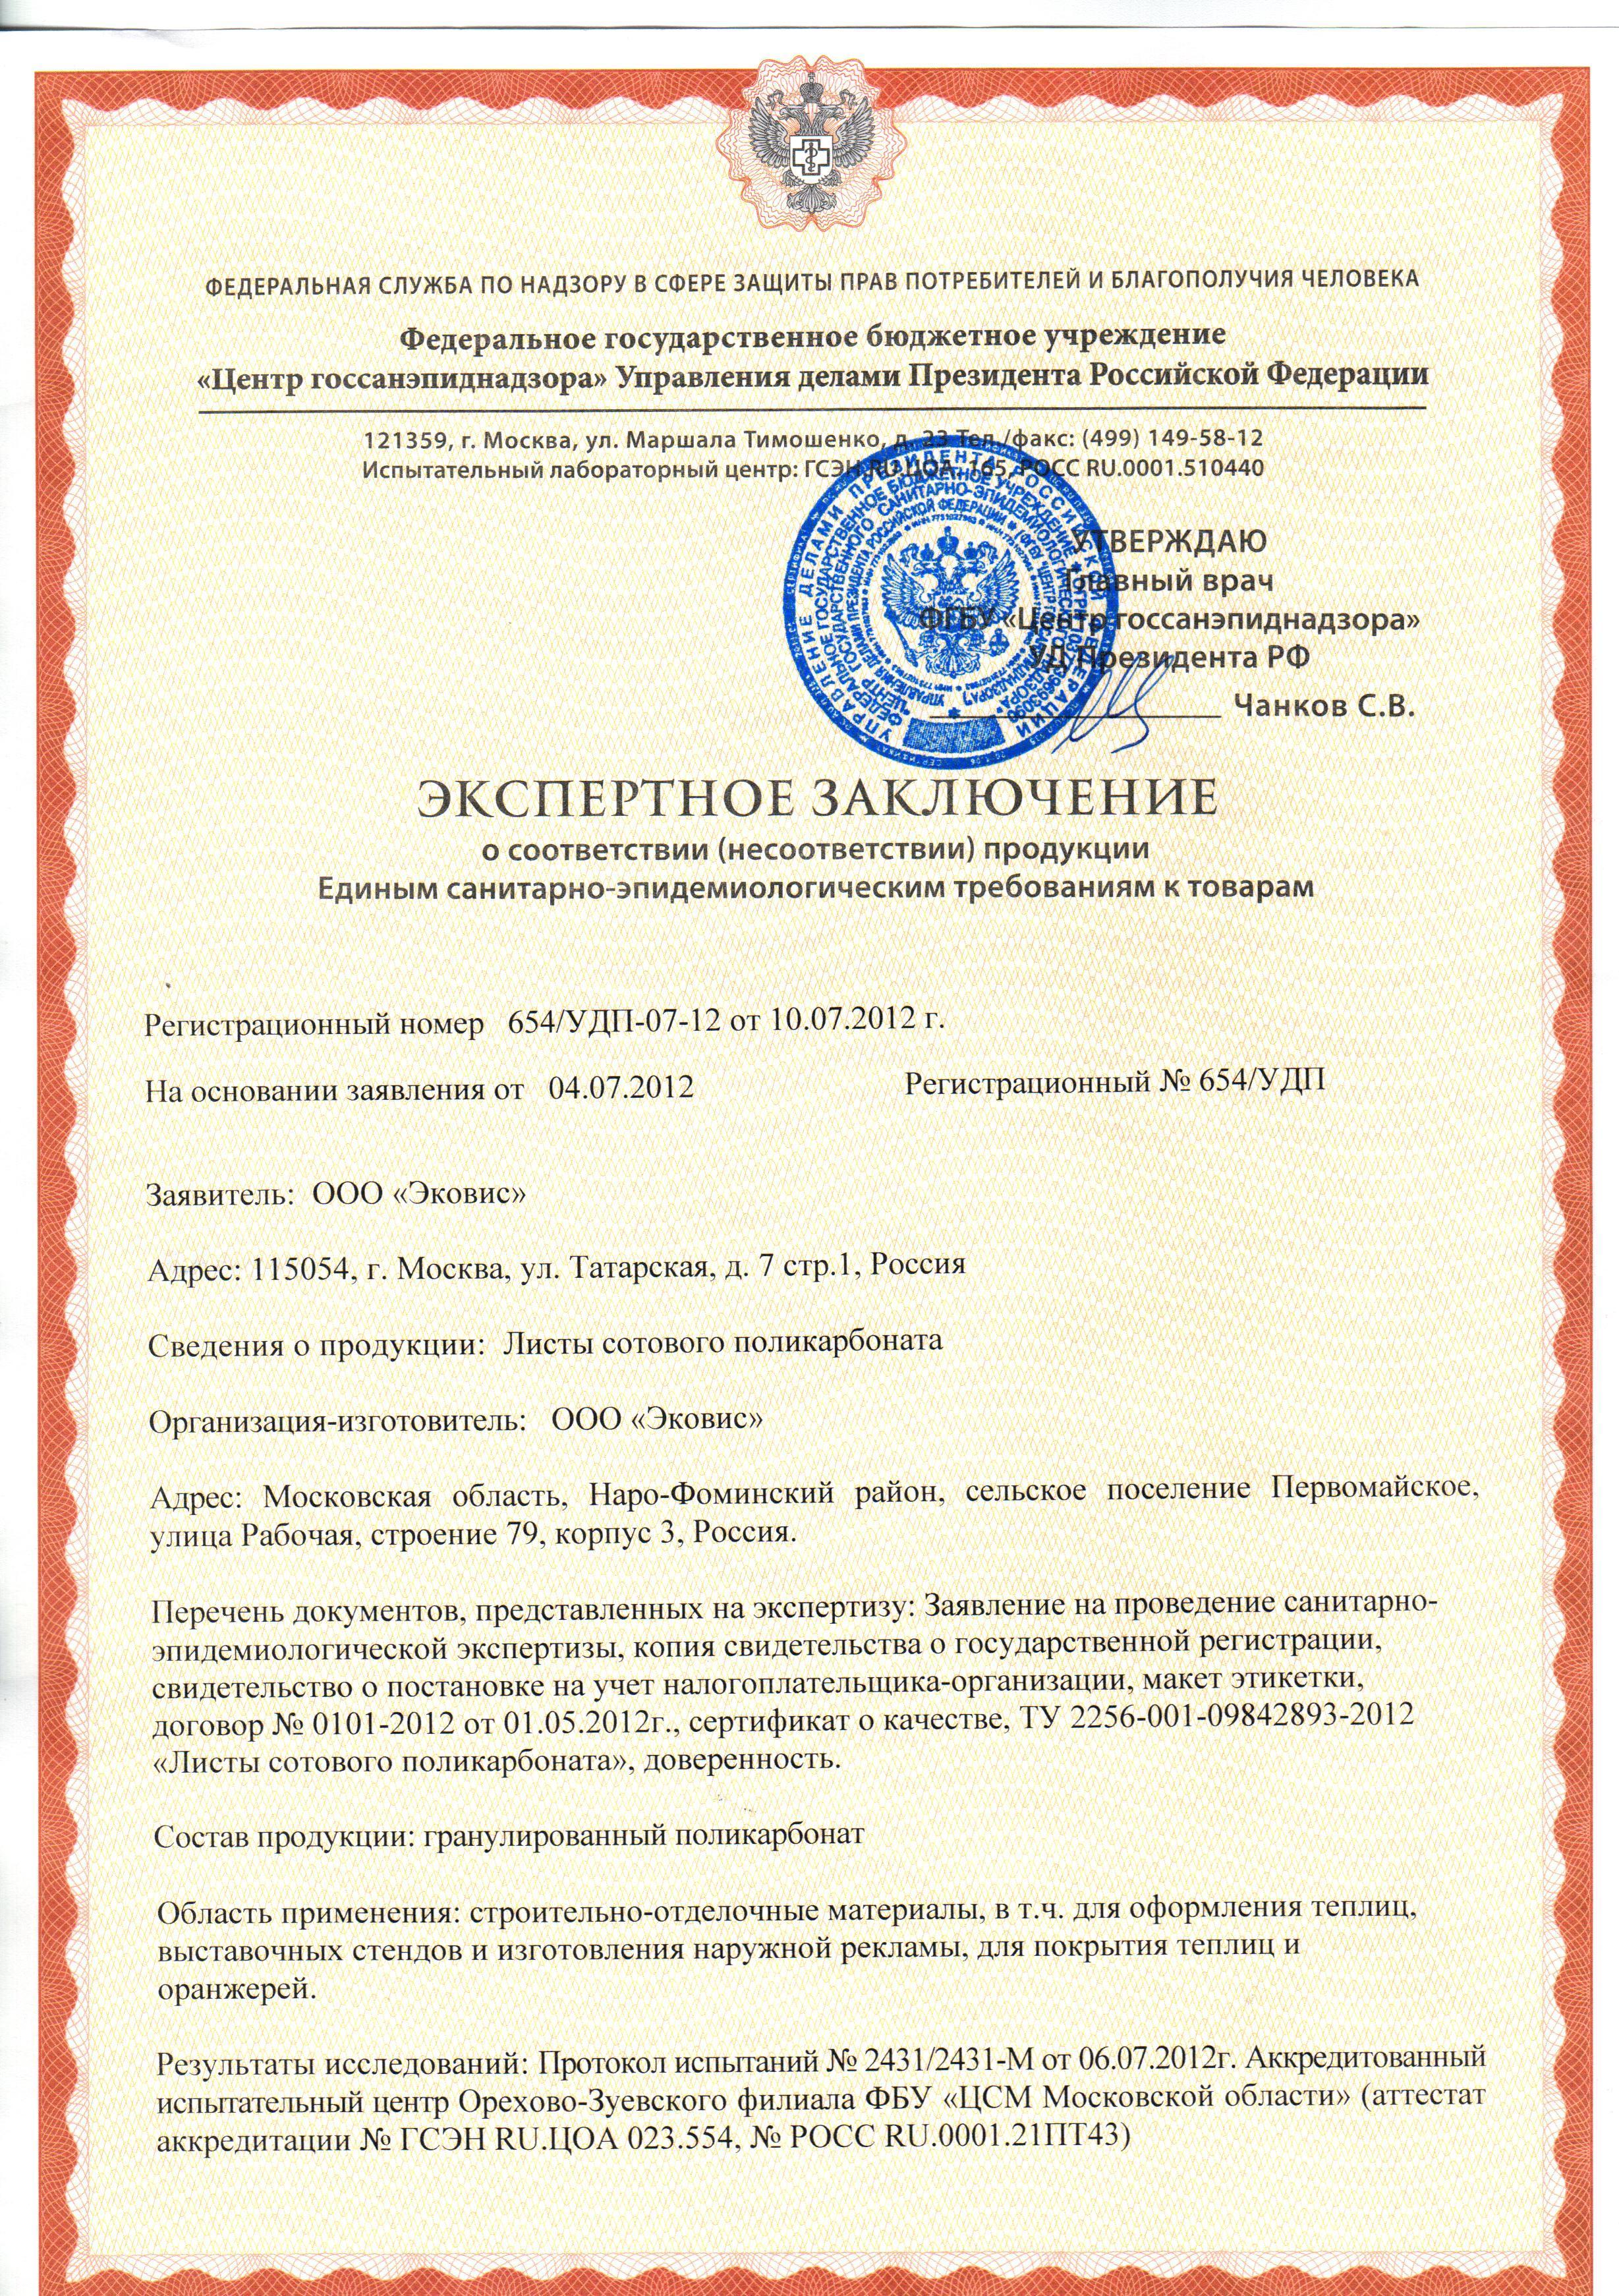 http://ecopoli.ru/images/upload/экспертное%20заключение.jpg